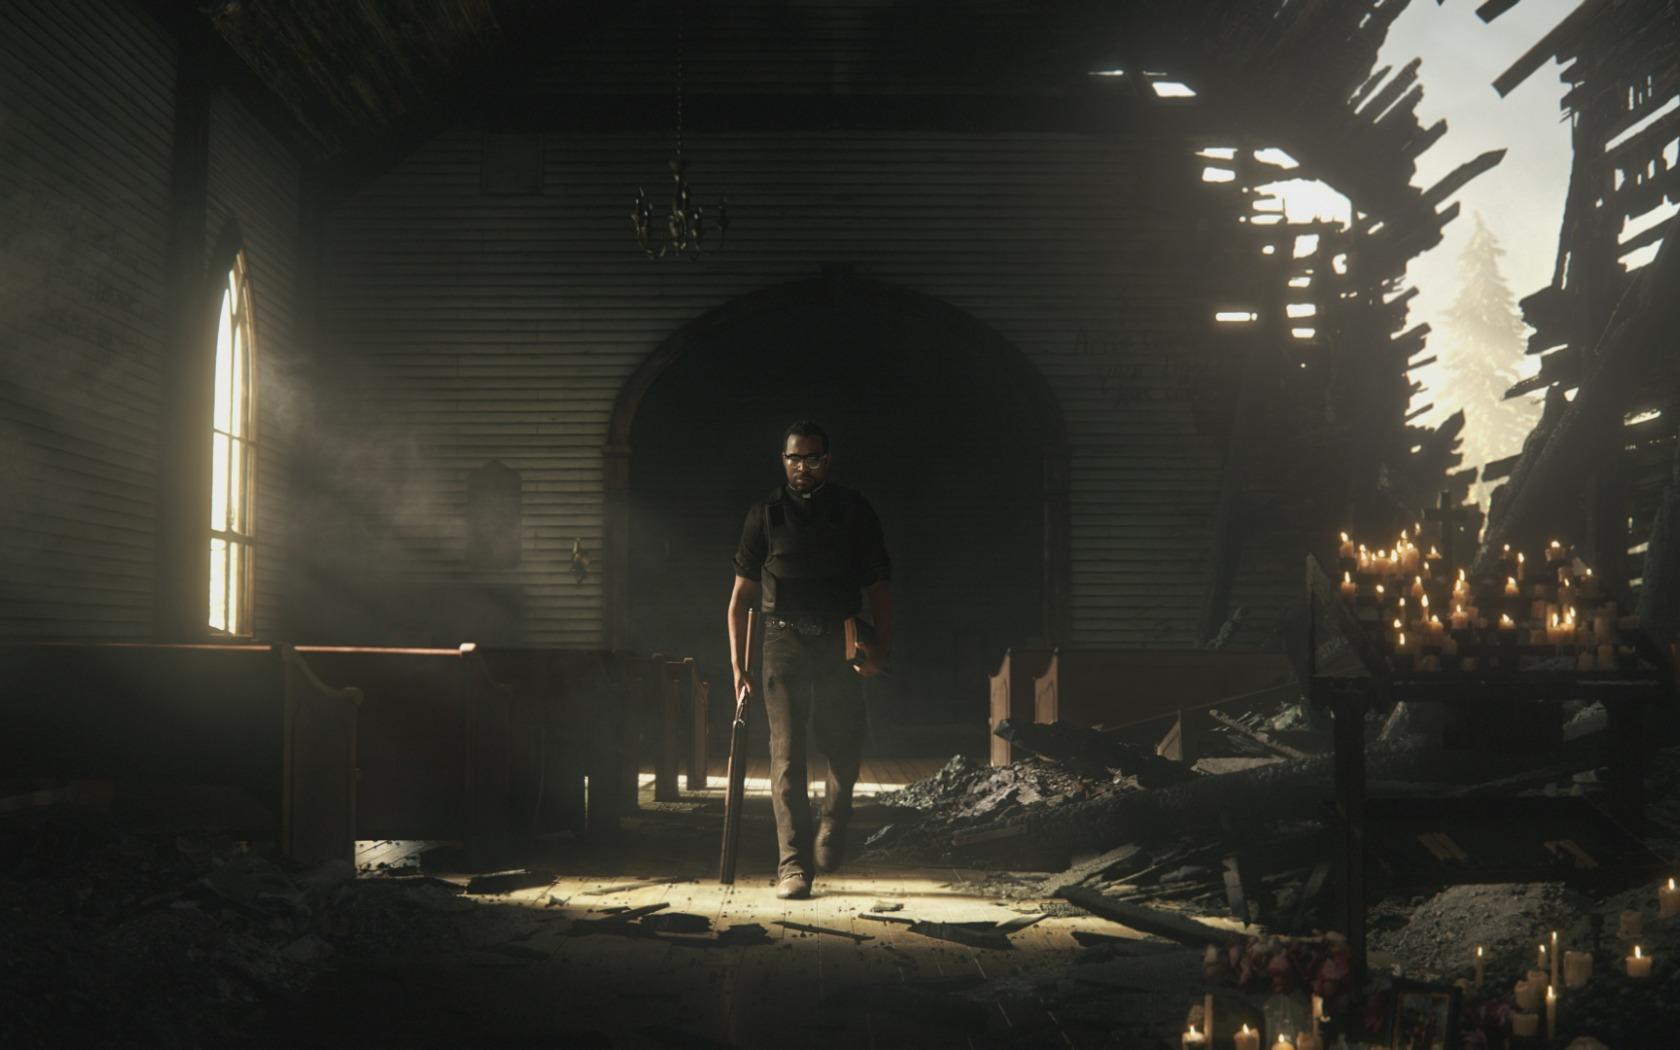 Wallpaper Video Games Far Cry 5 1680x1050 Utp 1171956 Hd